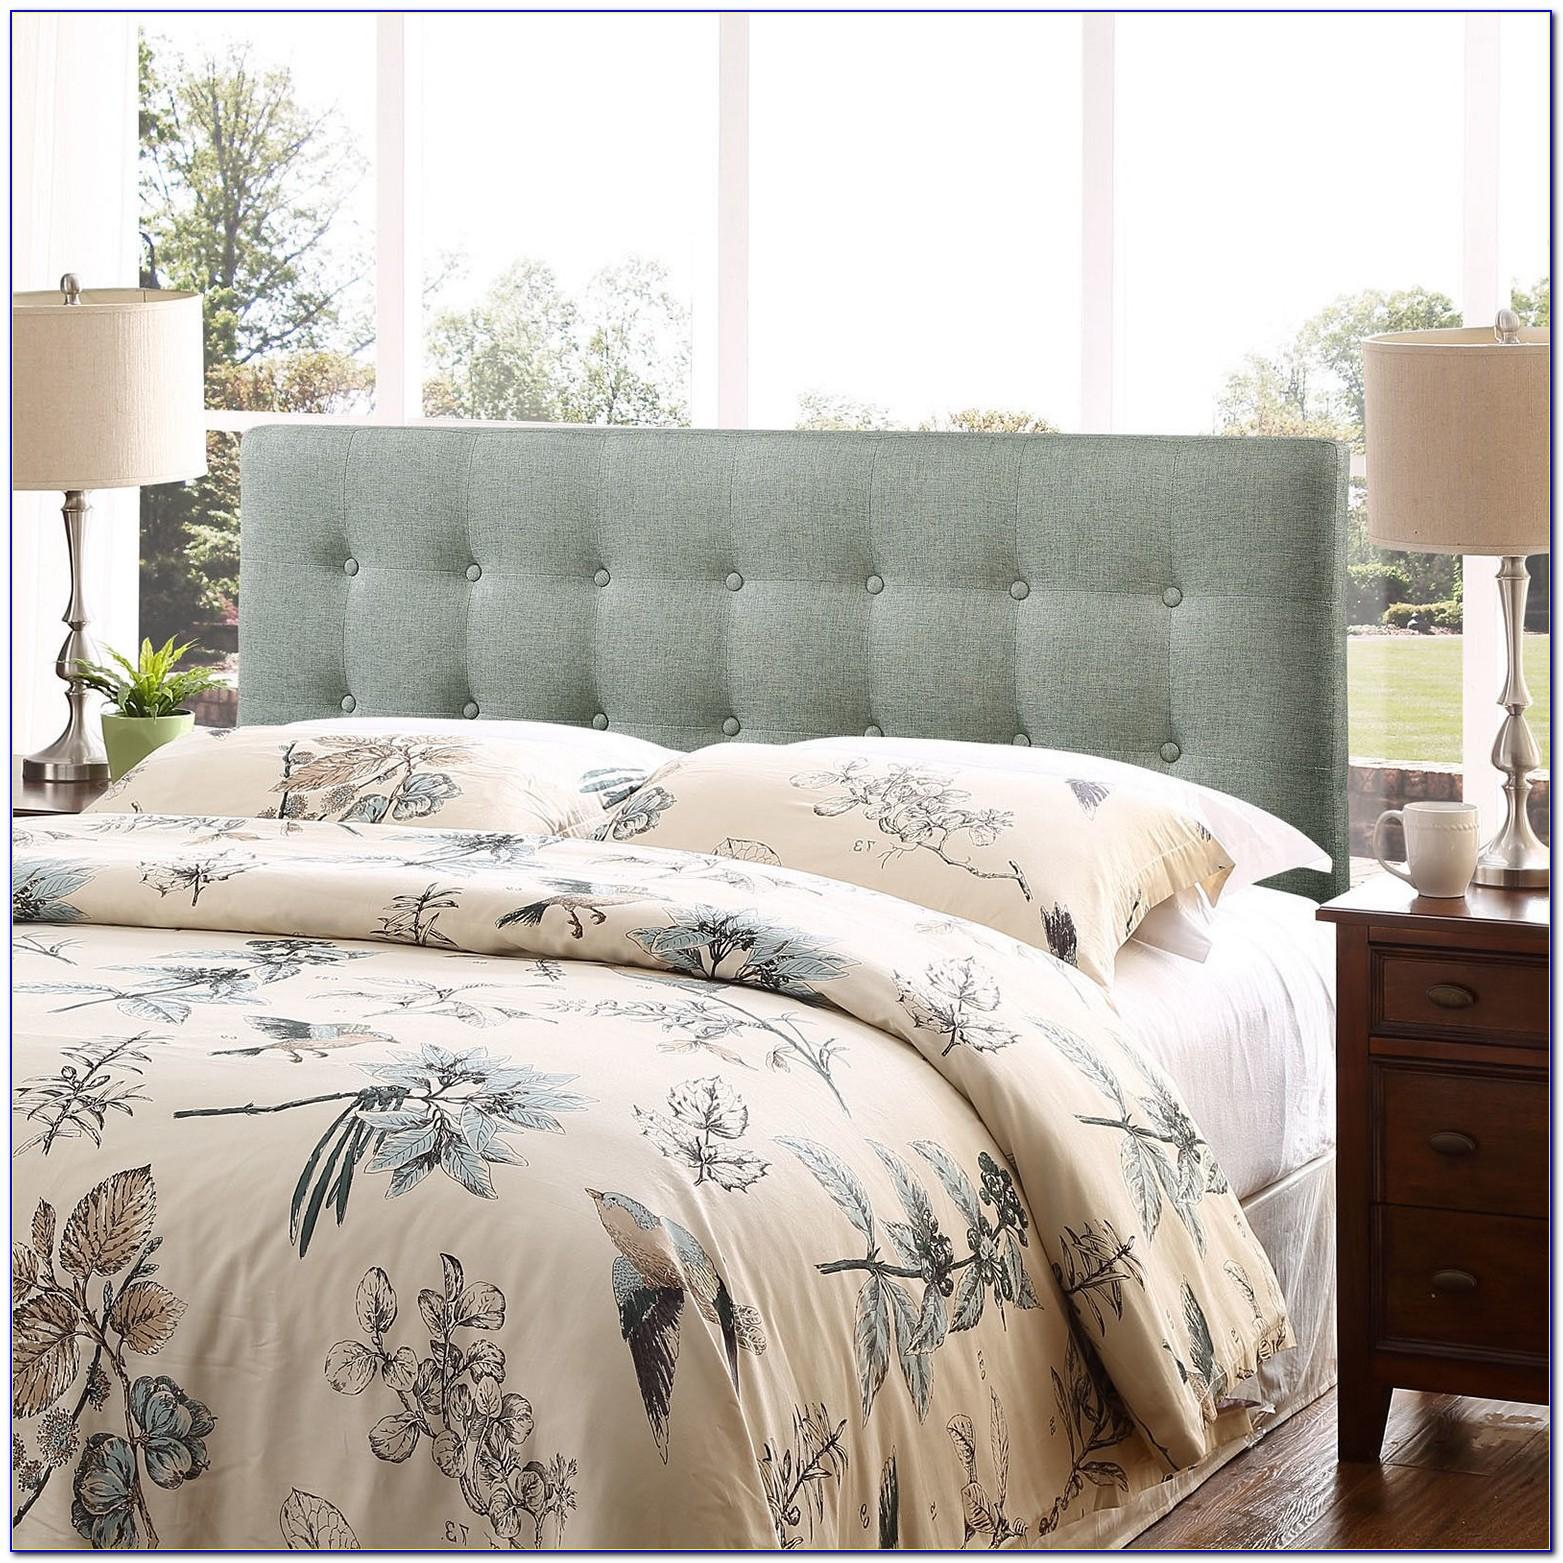 Diy Upholstered Headboard King Bed